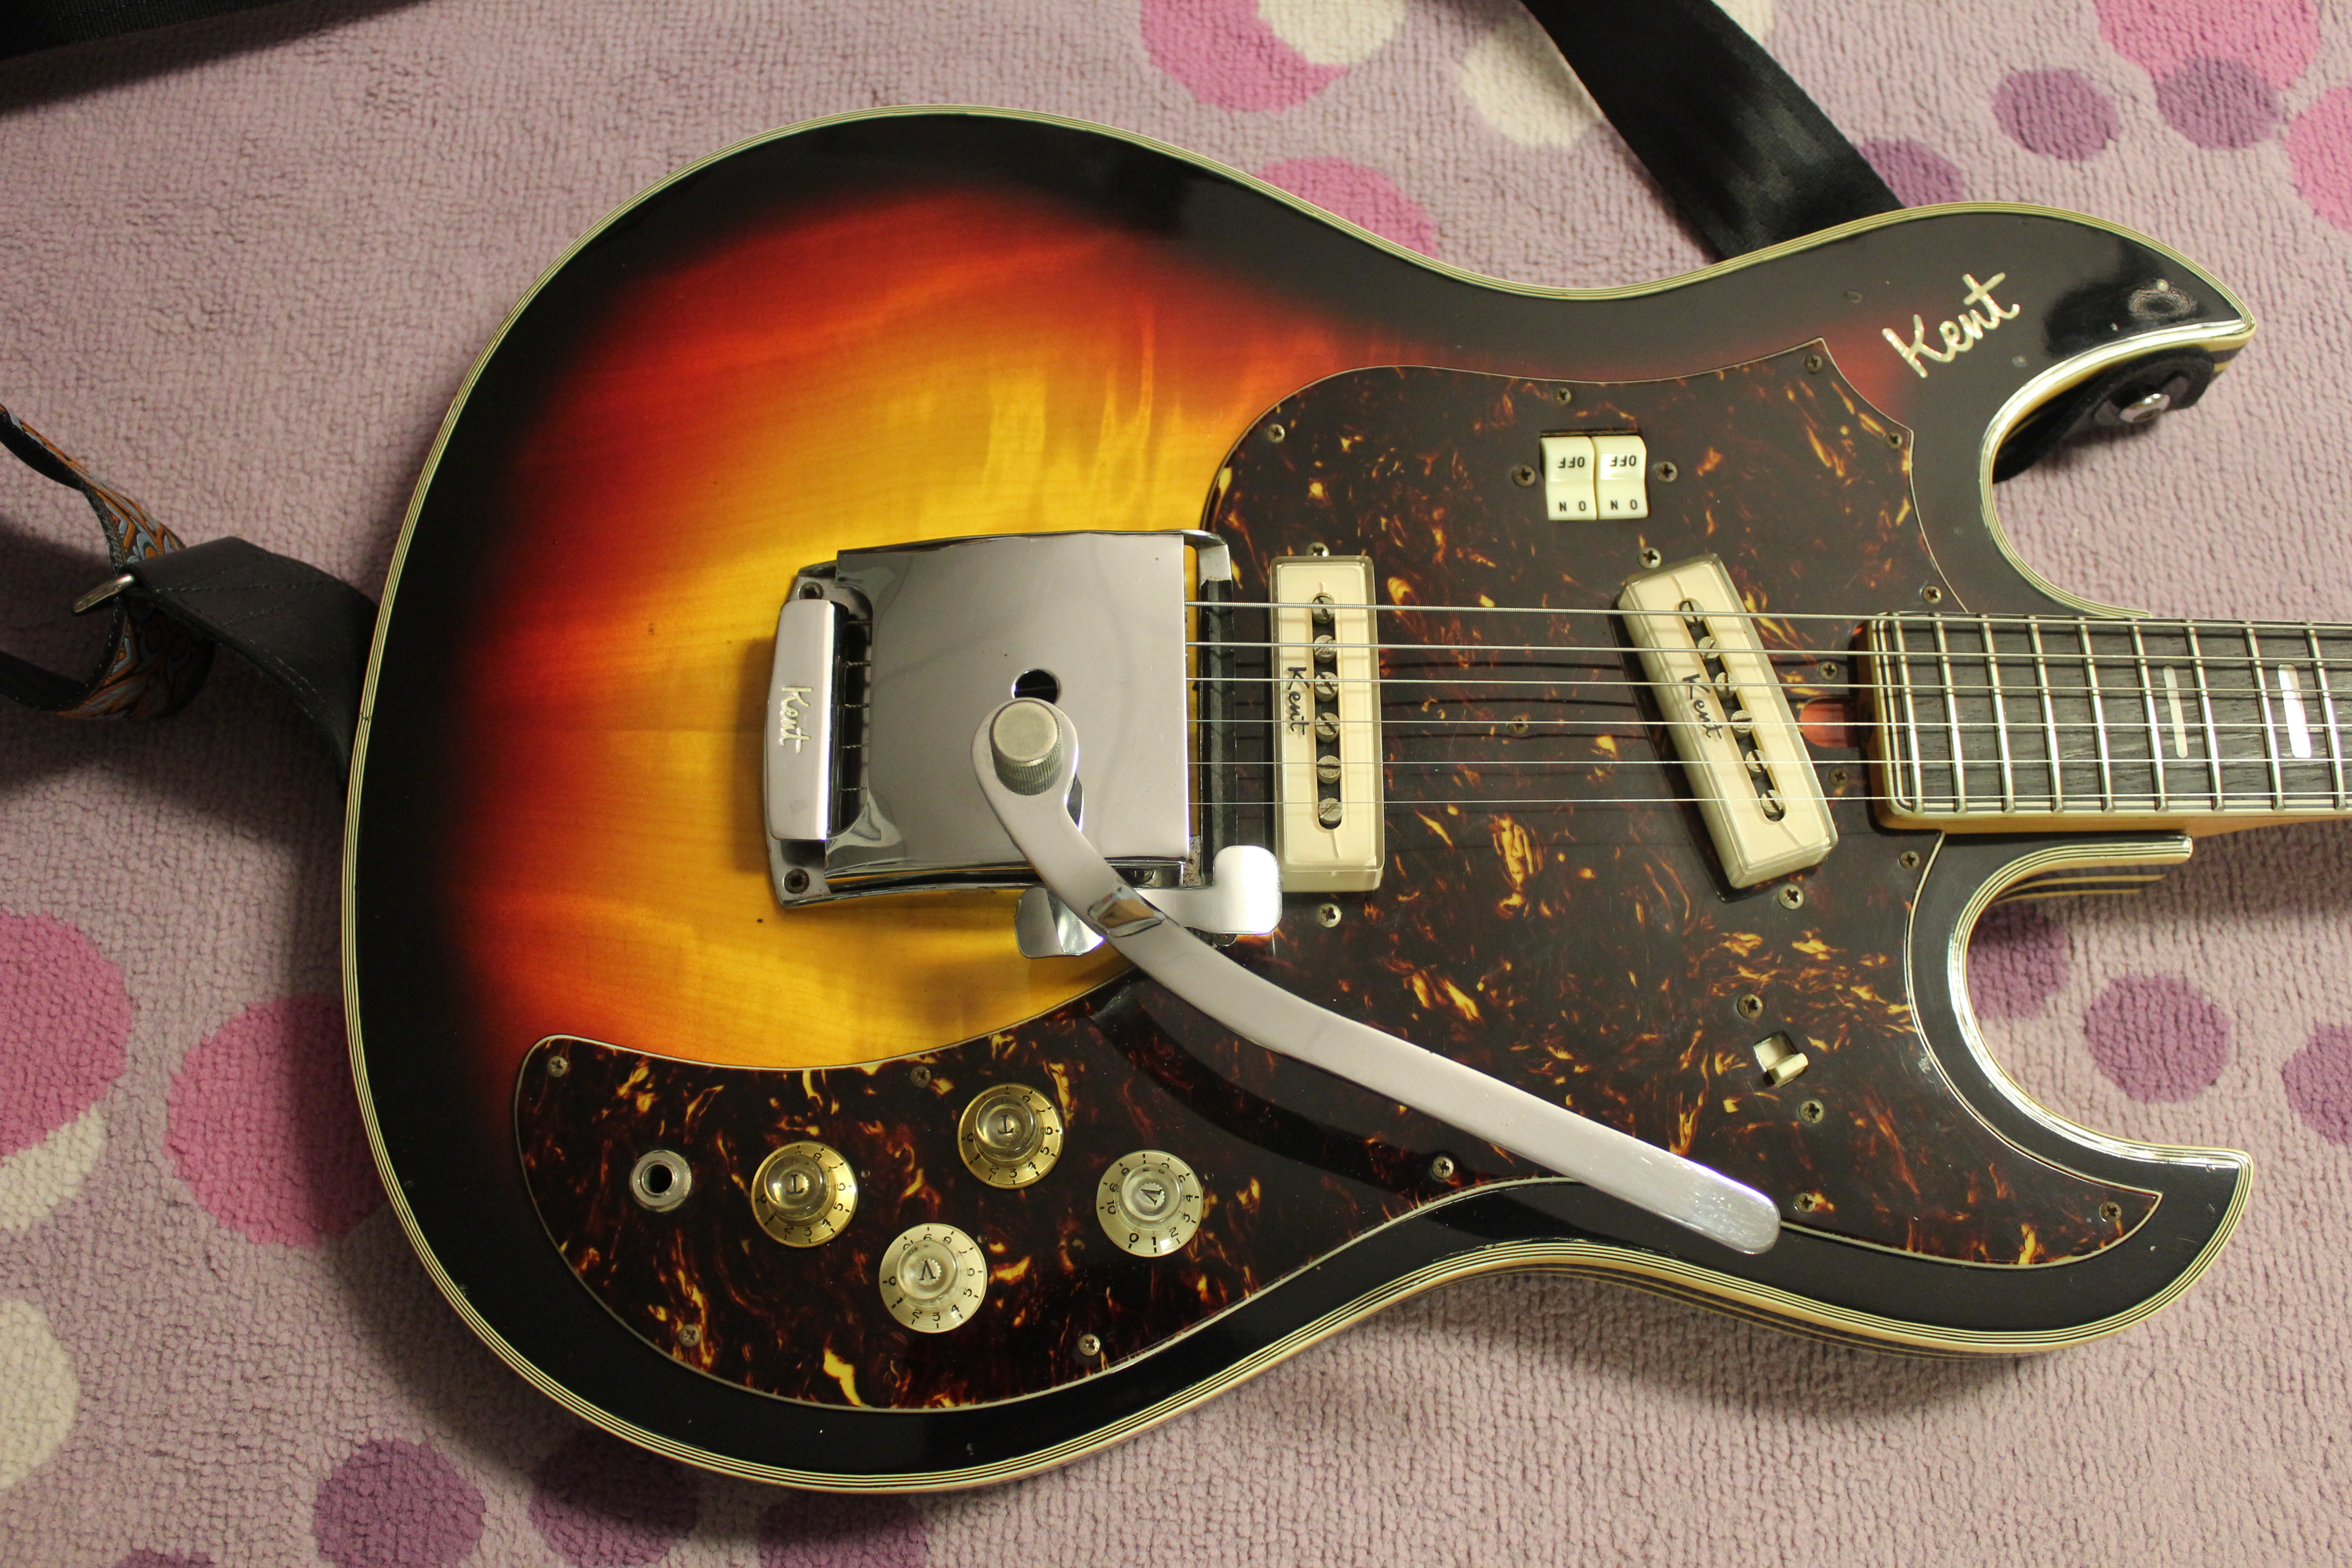 Teisco Guitar Wiring Diagram Imperial Input Jack 1967 69 Kent 740 Solidbody Electric Japan Made Drowning Rh Drowninginguitars Com